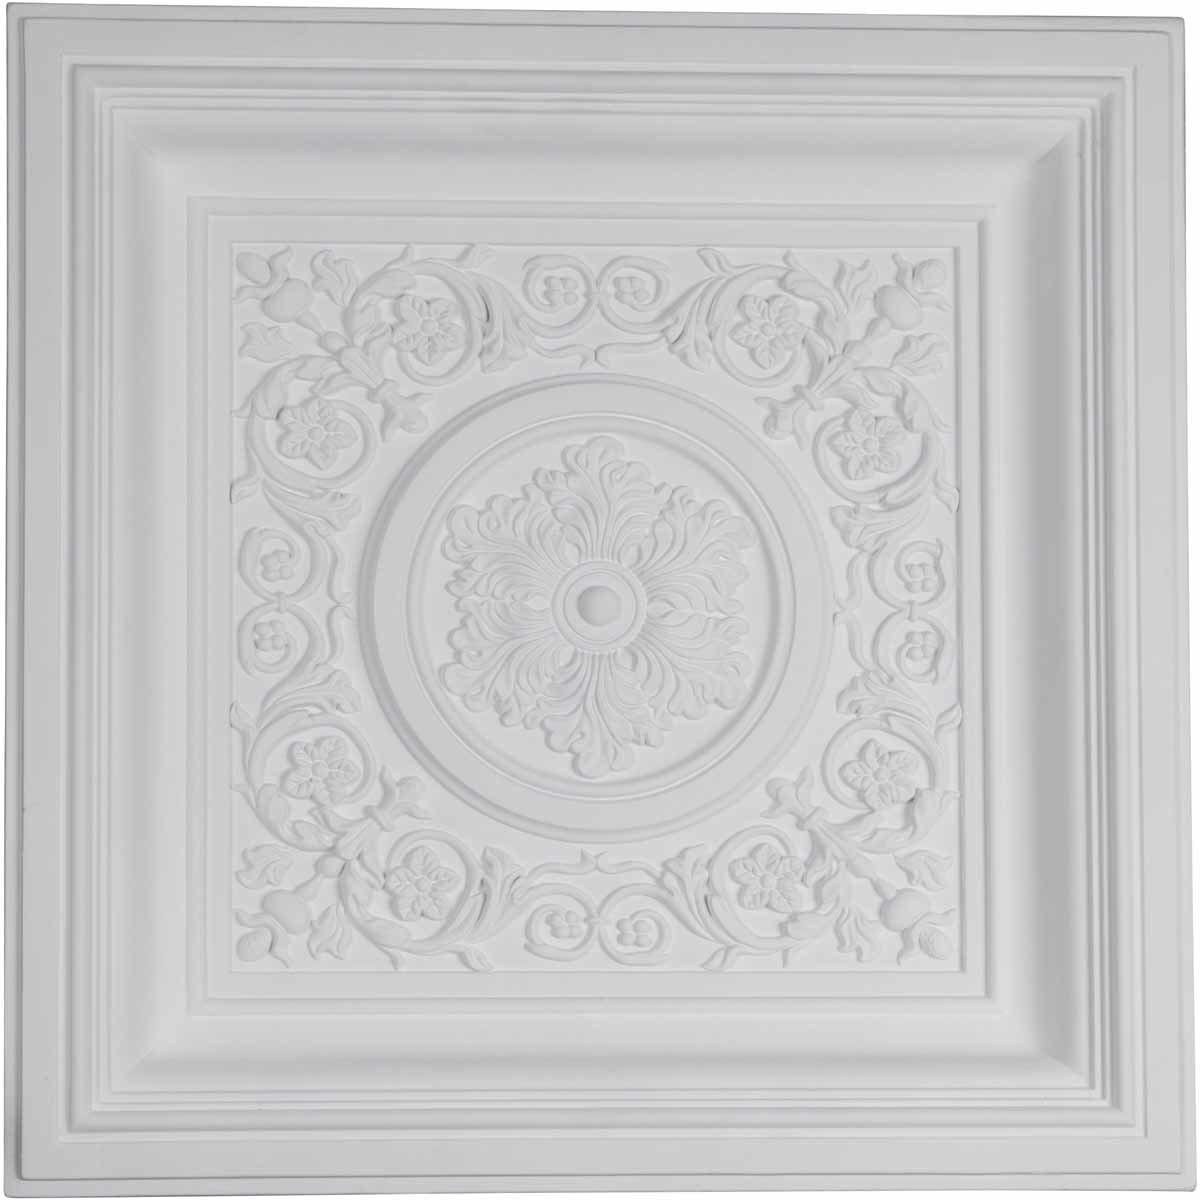 Ekena Millwork - Decorative Polyurethane Ceiling Tiles 150323911